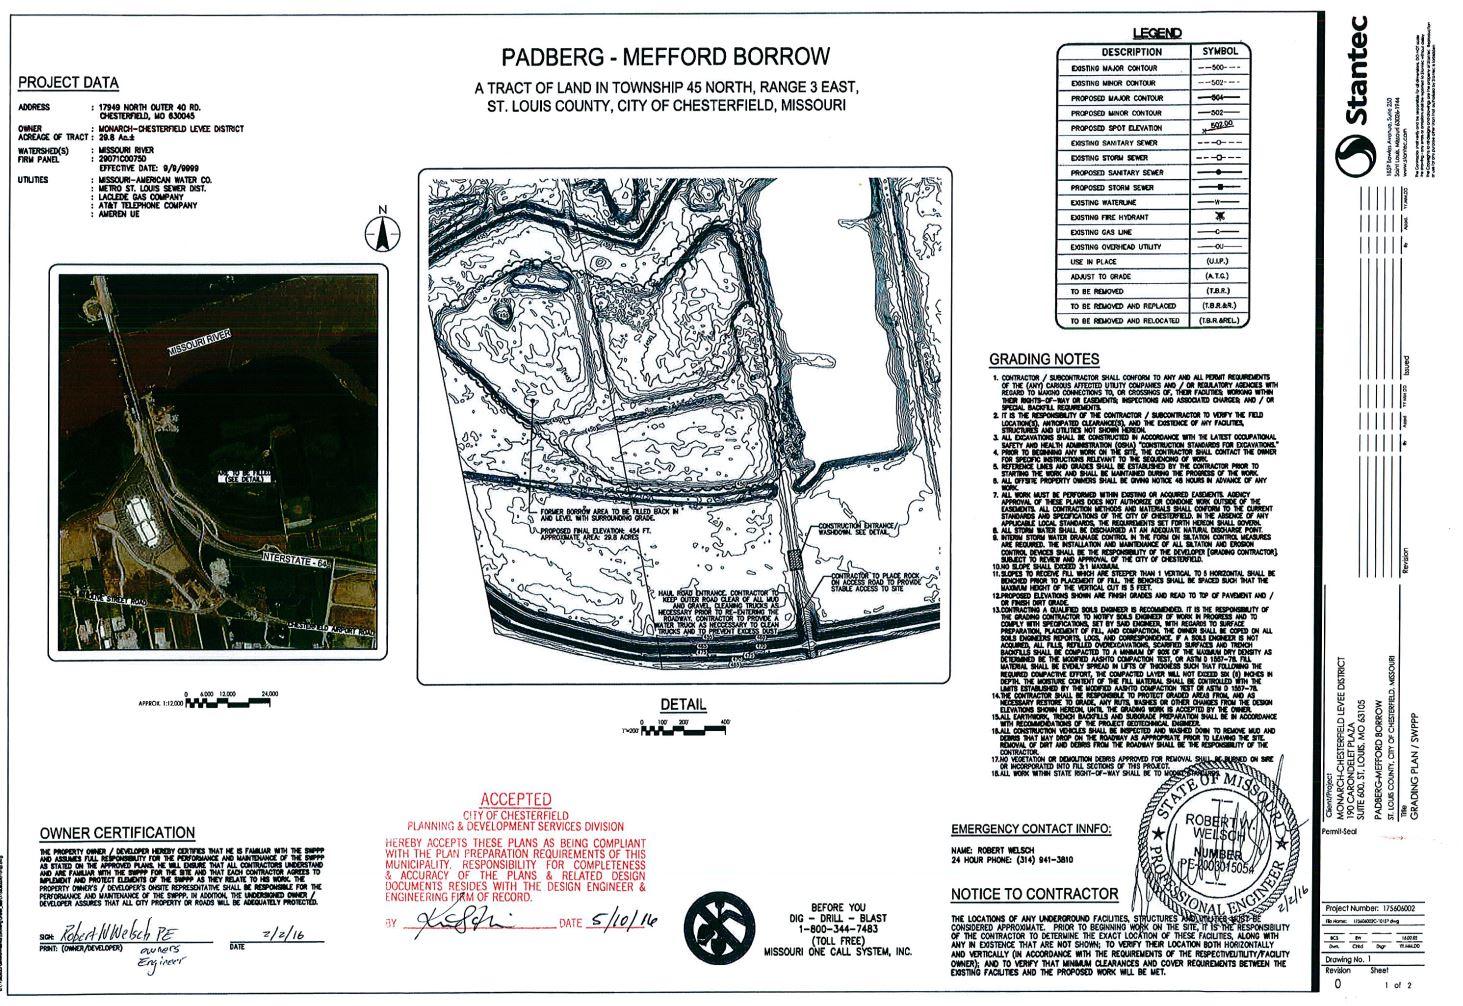 Padberg-Mefford Borrow Site